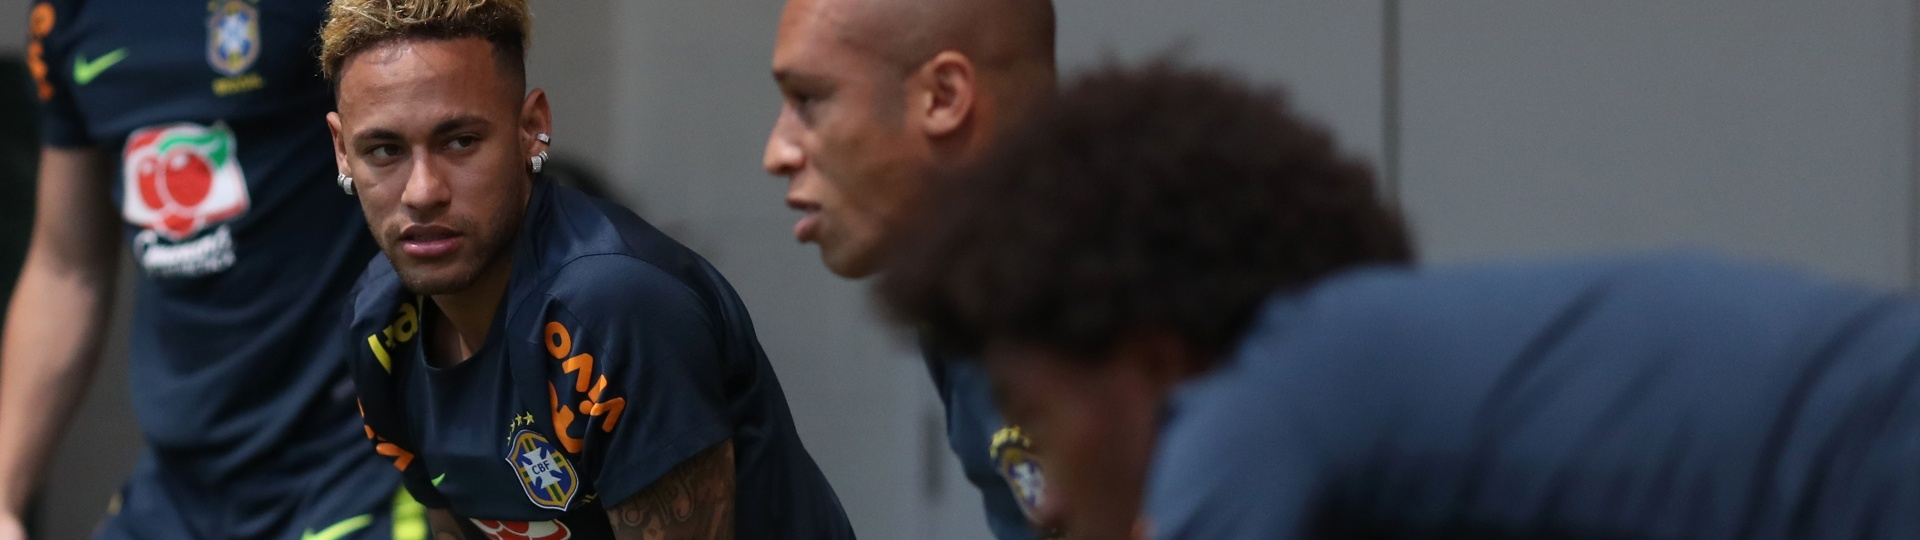 Neymar Miranda seleção brasileira treino